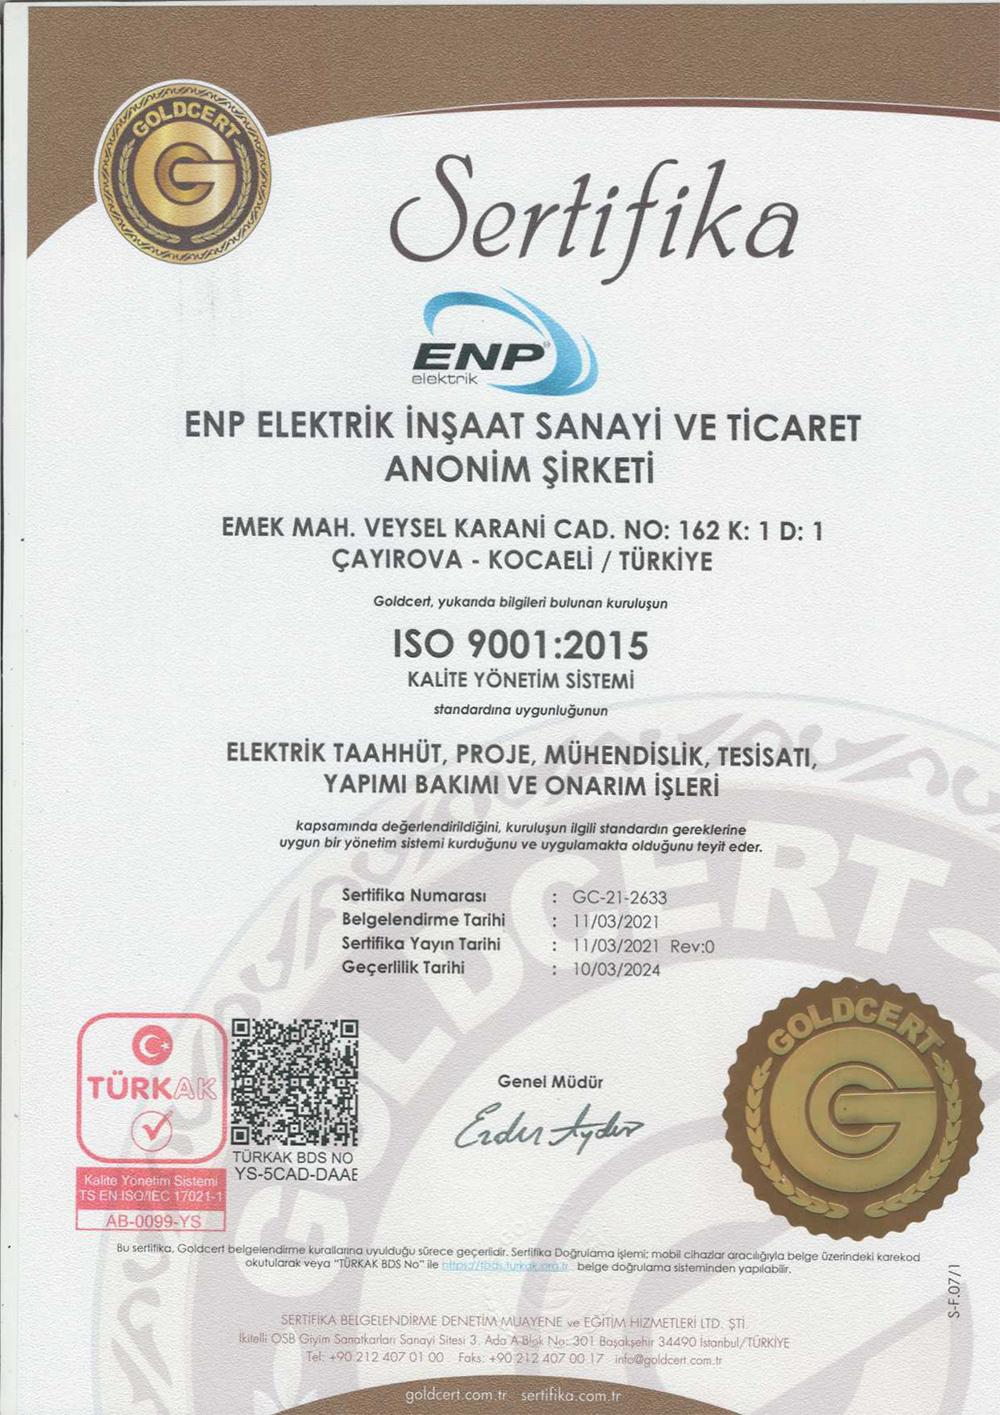 ENP ELEKTRIK ISO 9001 SERTIFIKA